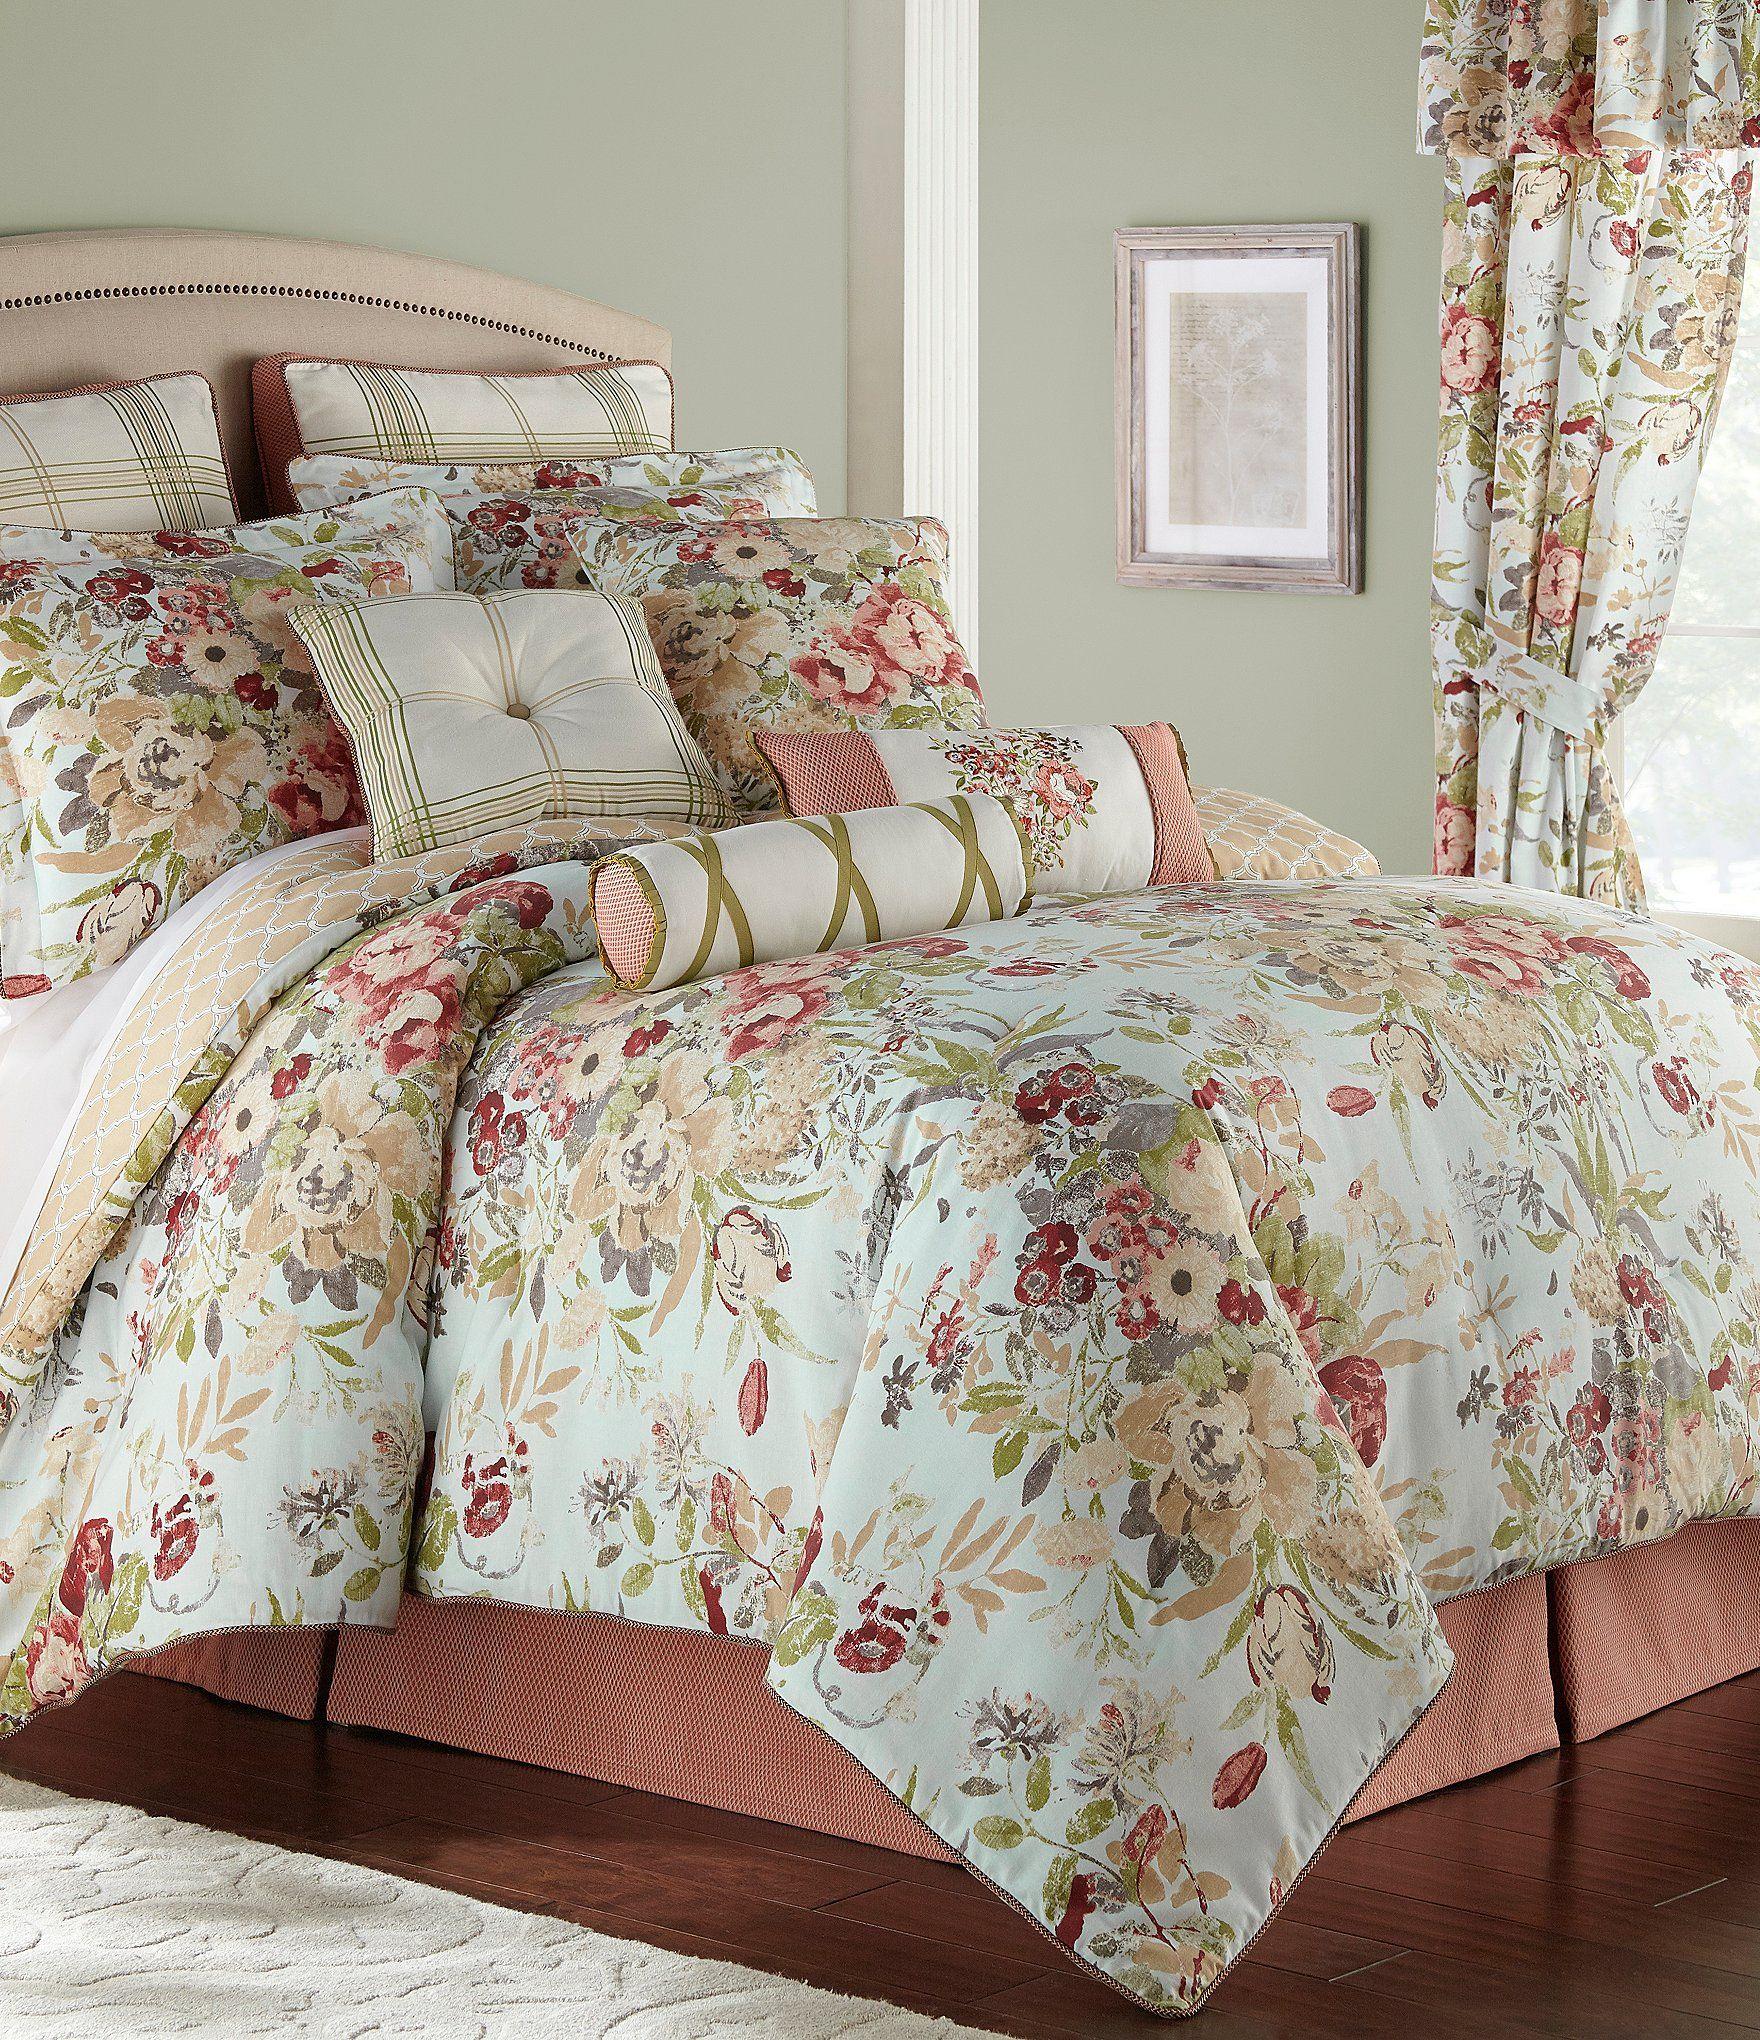 Rose Tree Lorraine Floral Comforter Set Dillards Floral Comforter Sets Comforter Sets Floral Comforter